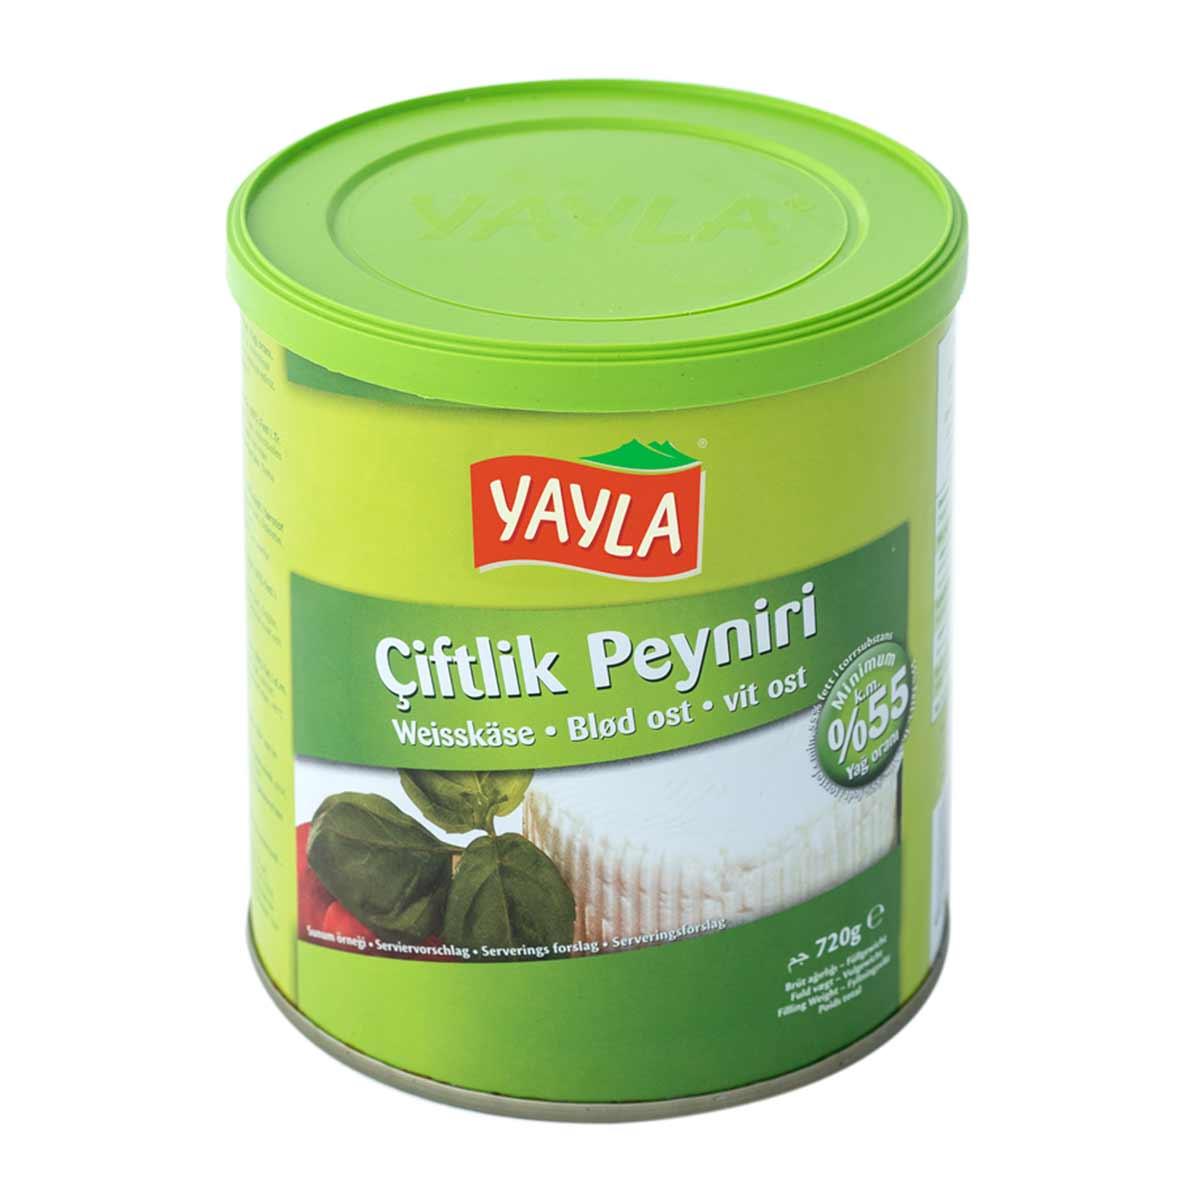 Weißkäse 55 % - beyaz peynir - Çiftlik Peyniri von Yayla